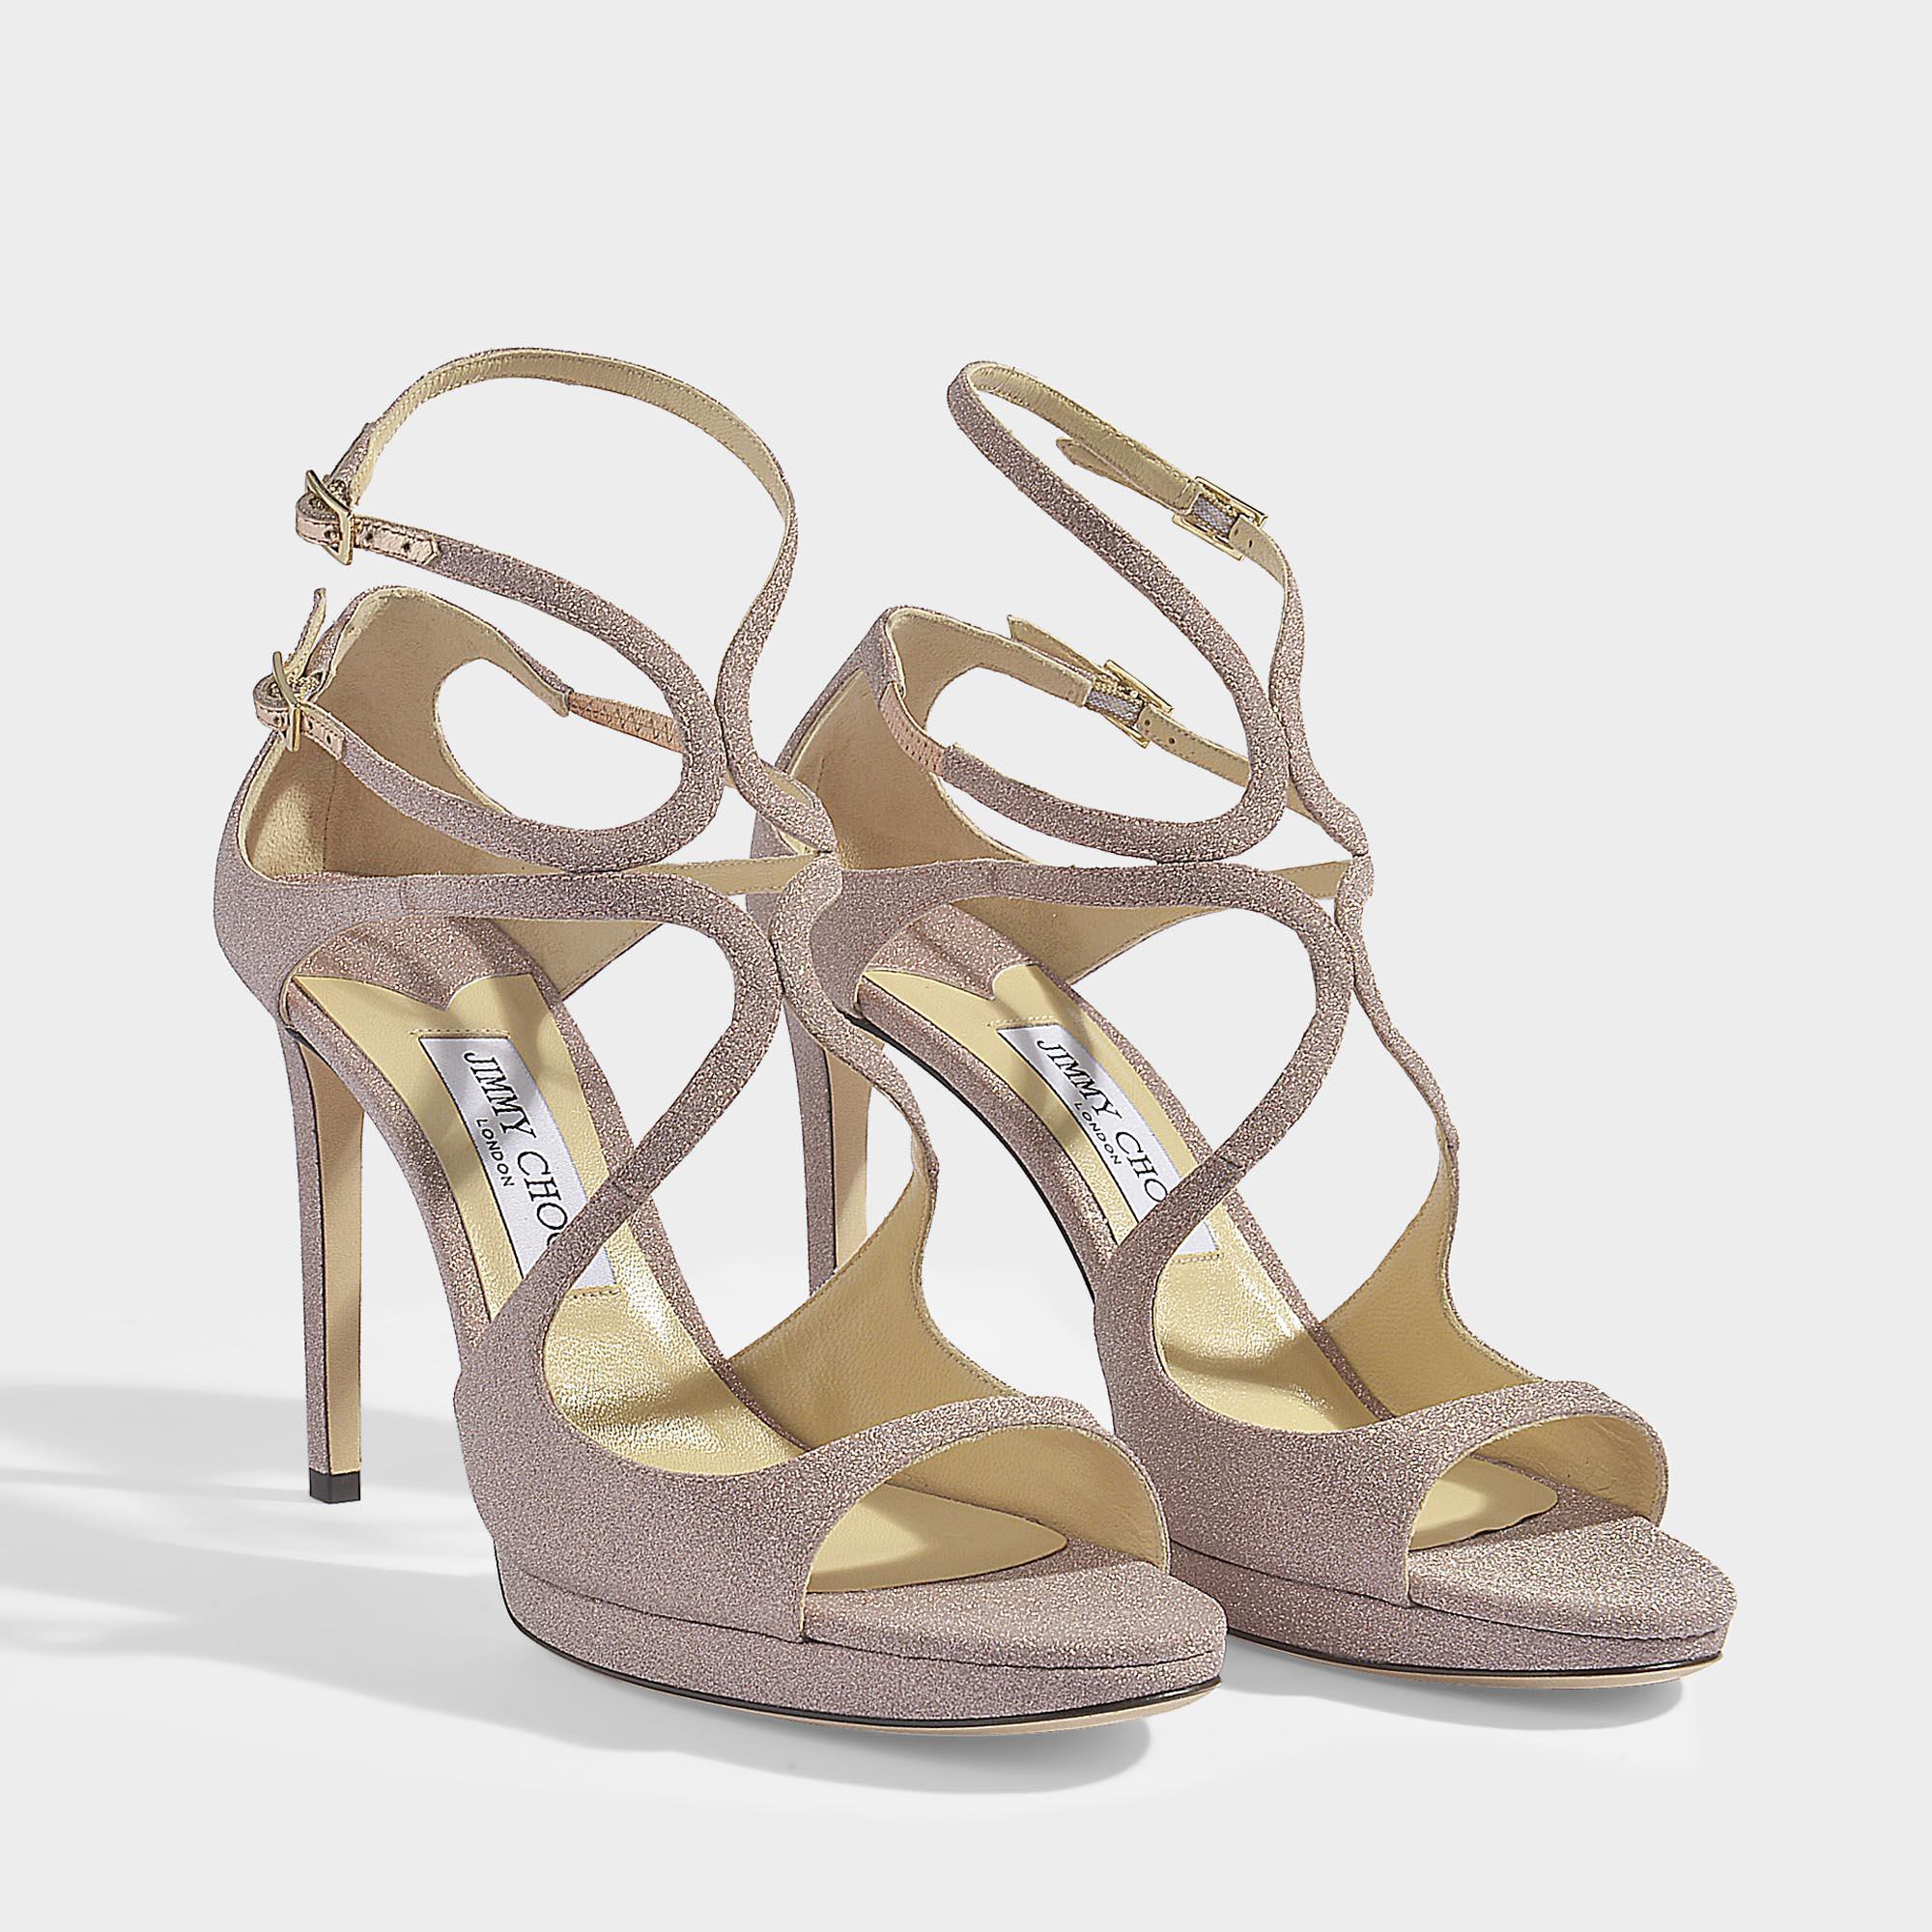 871aeb43516 Lyst - Jimmy Choo Lance 100 Cross Front Sandals In Ballet Pink Fine ...